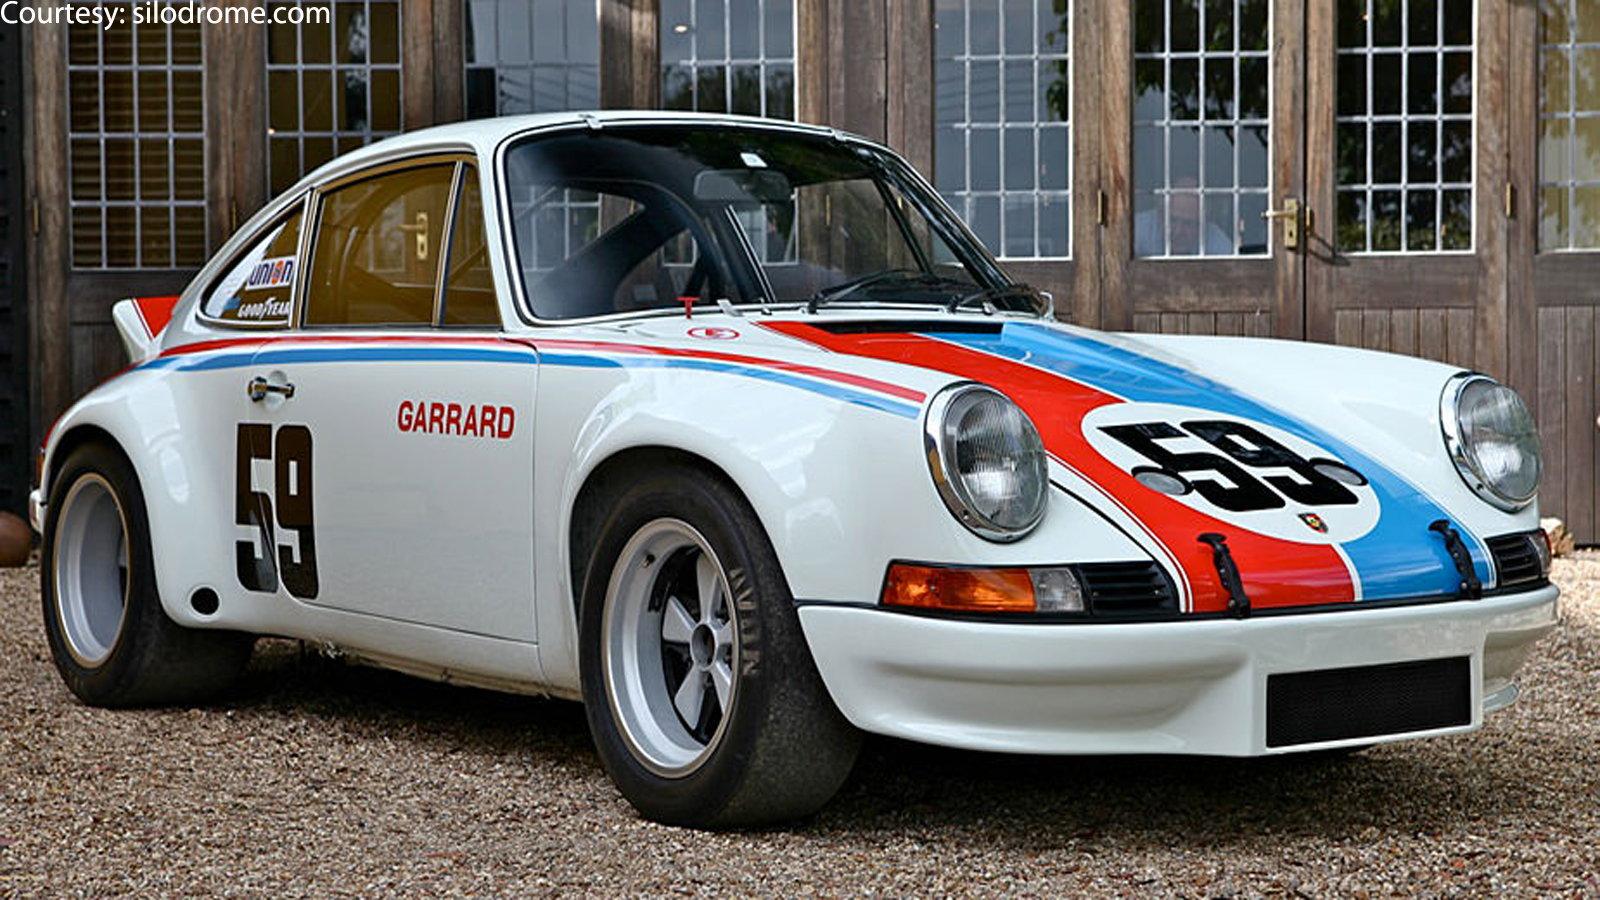 9 facts about the 1973 74 porsche carrera 911rs rennlist ultra rare rsr race version vanachro Images